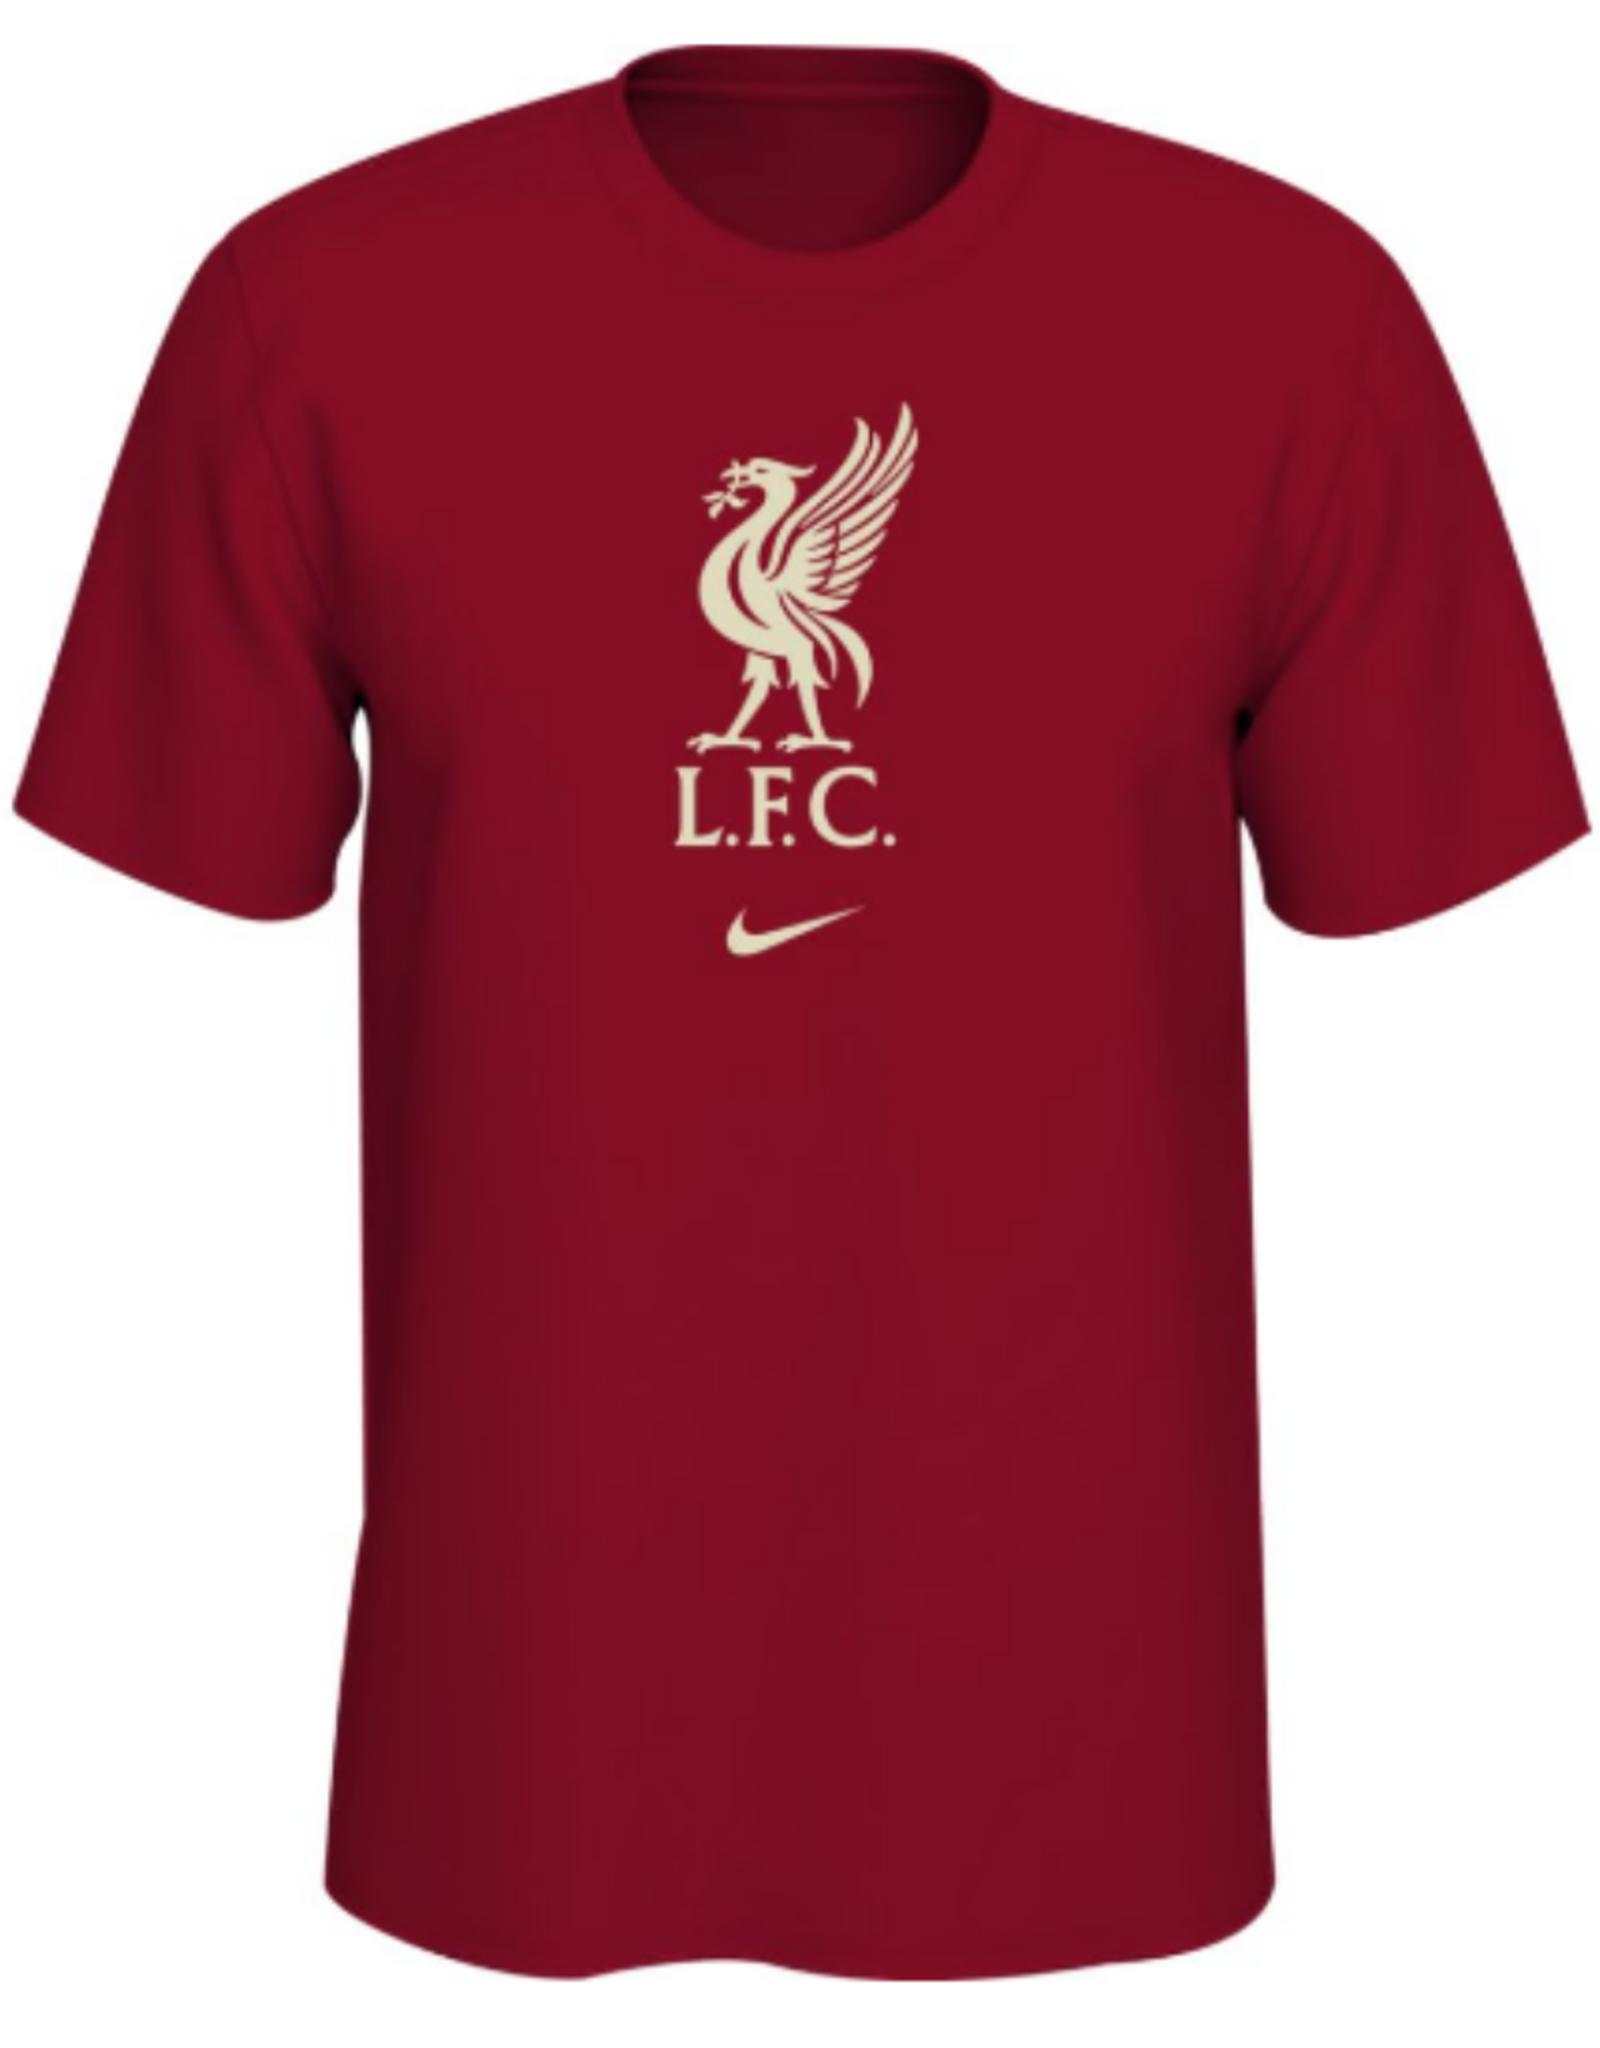 Nike Men's Evergreen Crest T-Shirt Liverpool Red